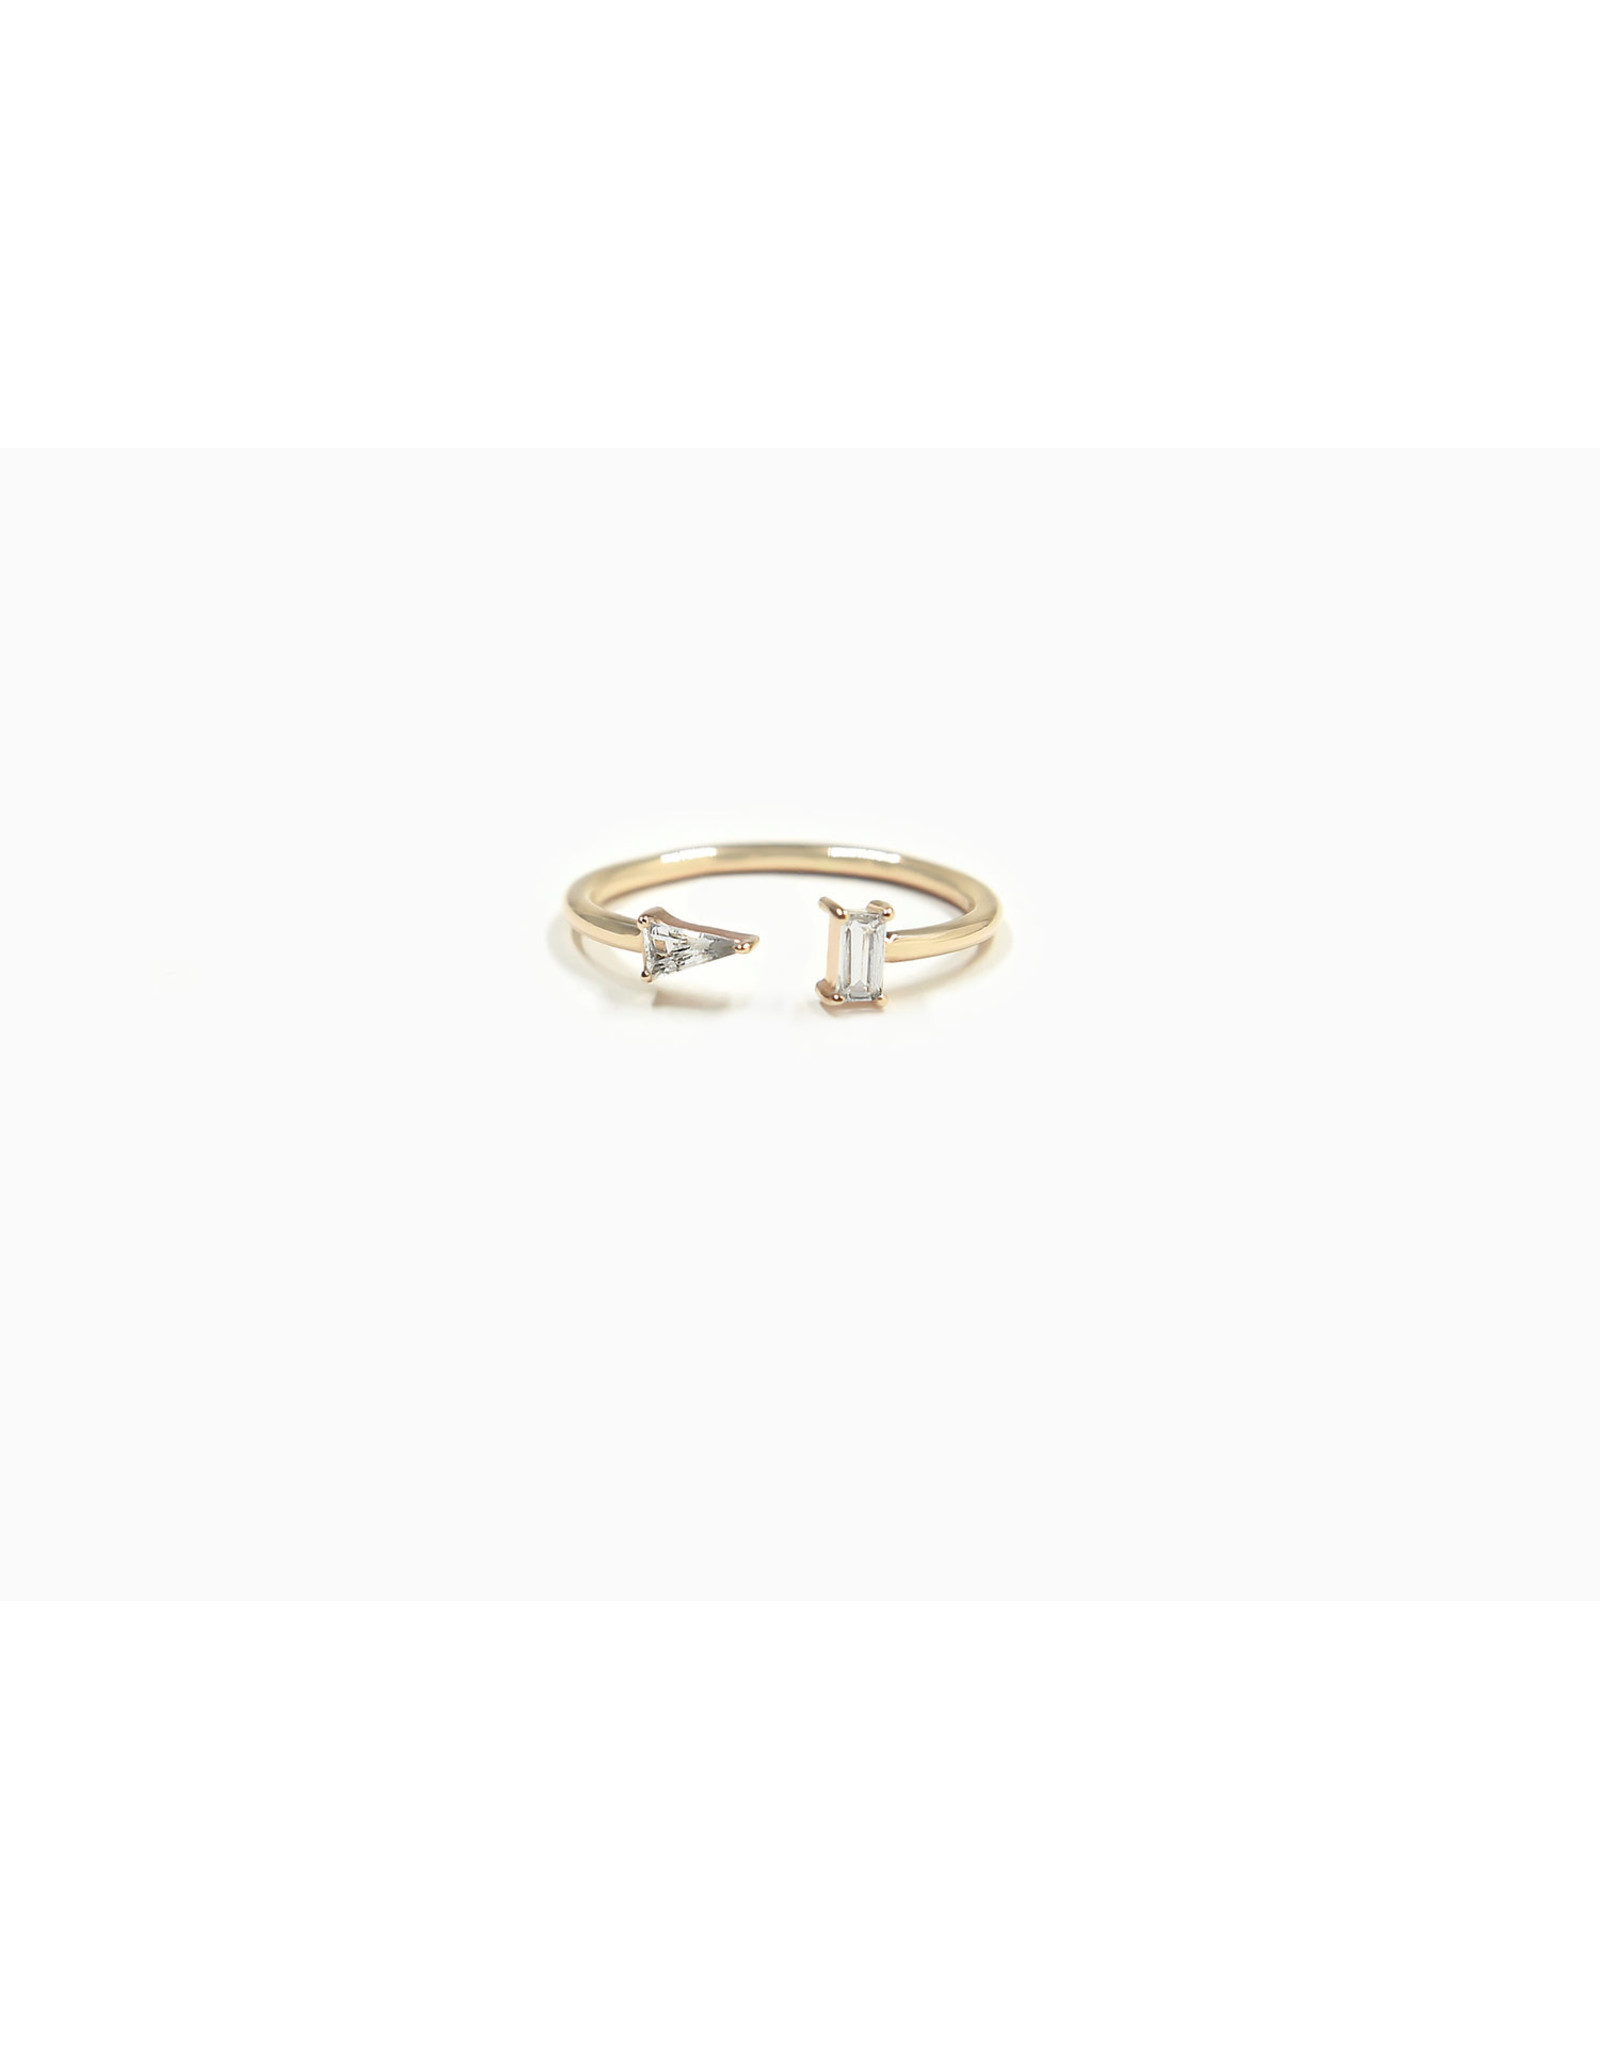 Bondeye Jewelry Bondeye Luna White Topaz Ring (Size: 6, Color: Yellow Gold / White Topaz)